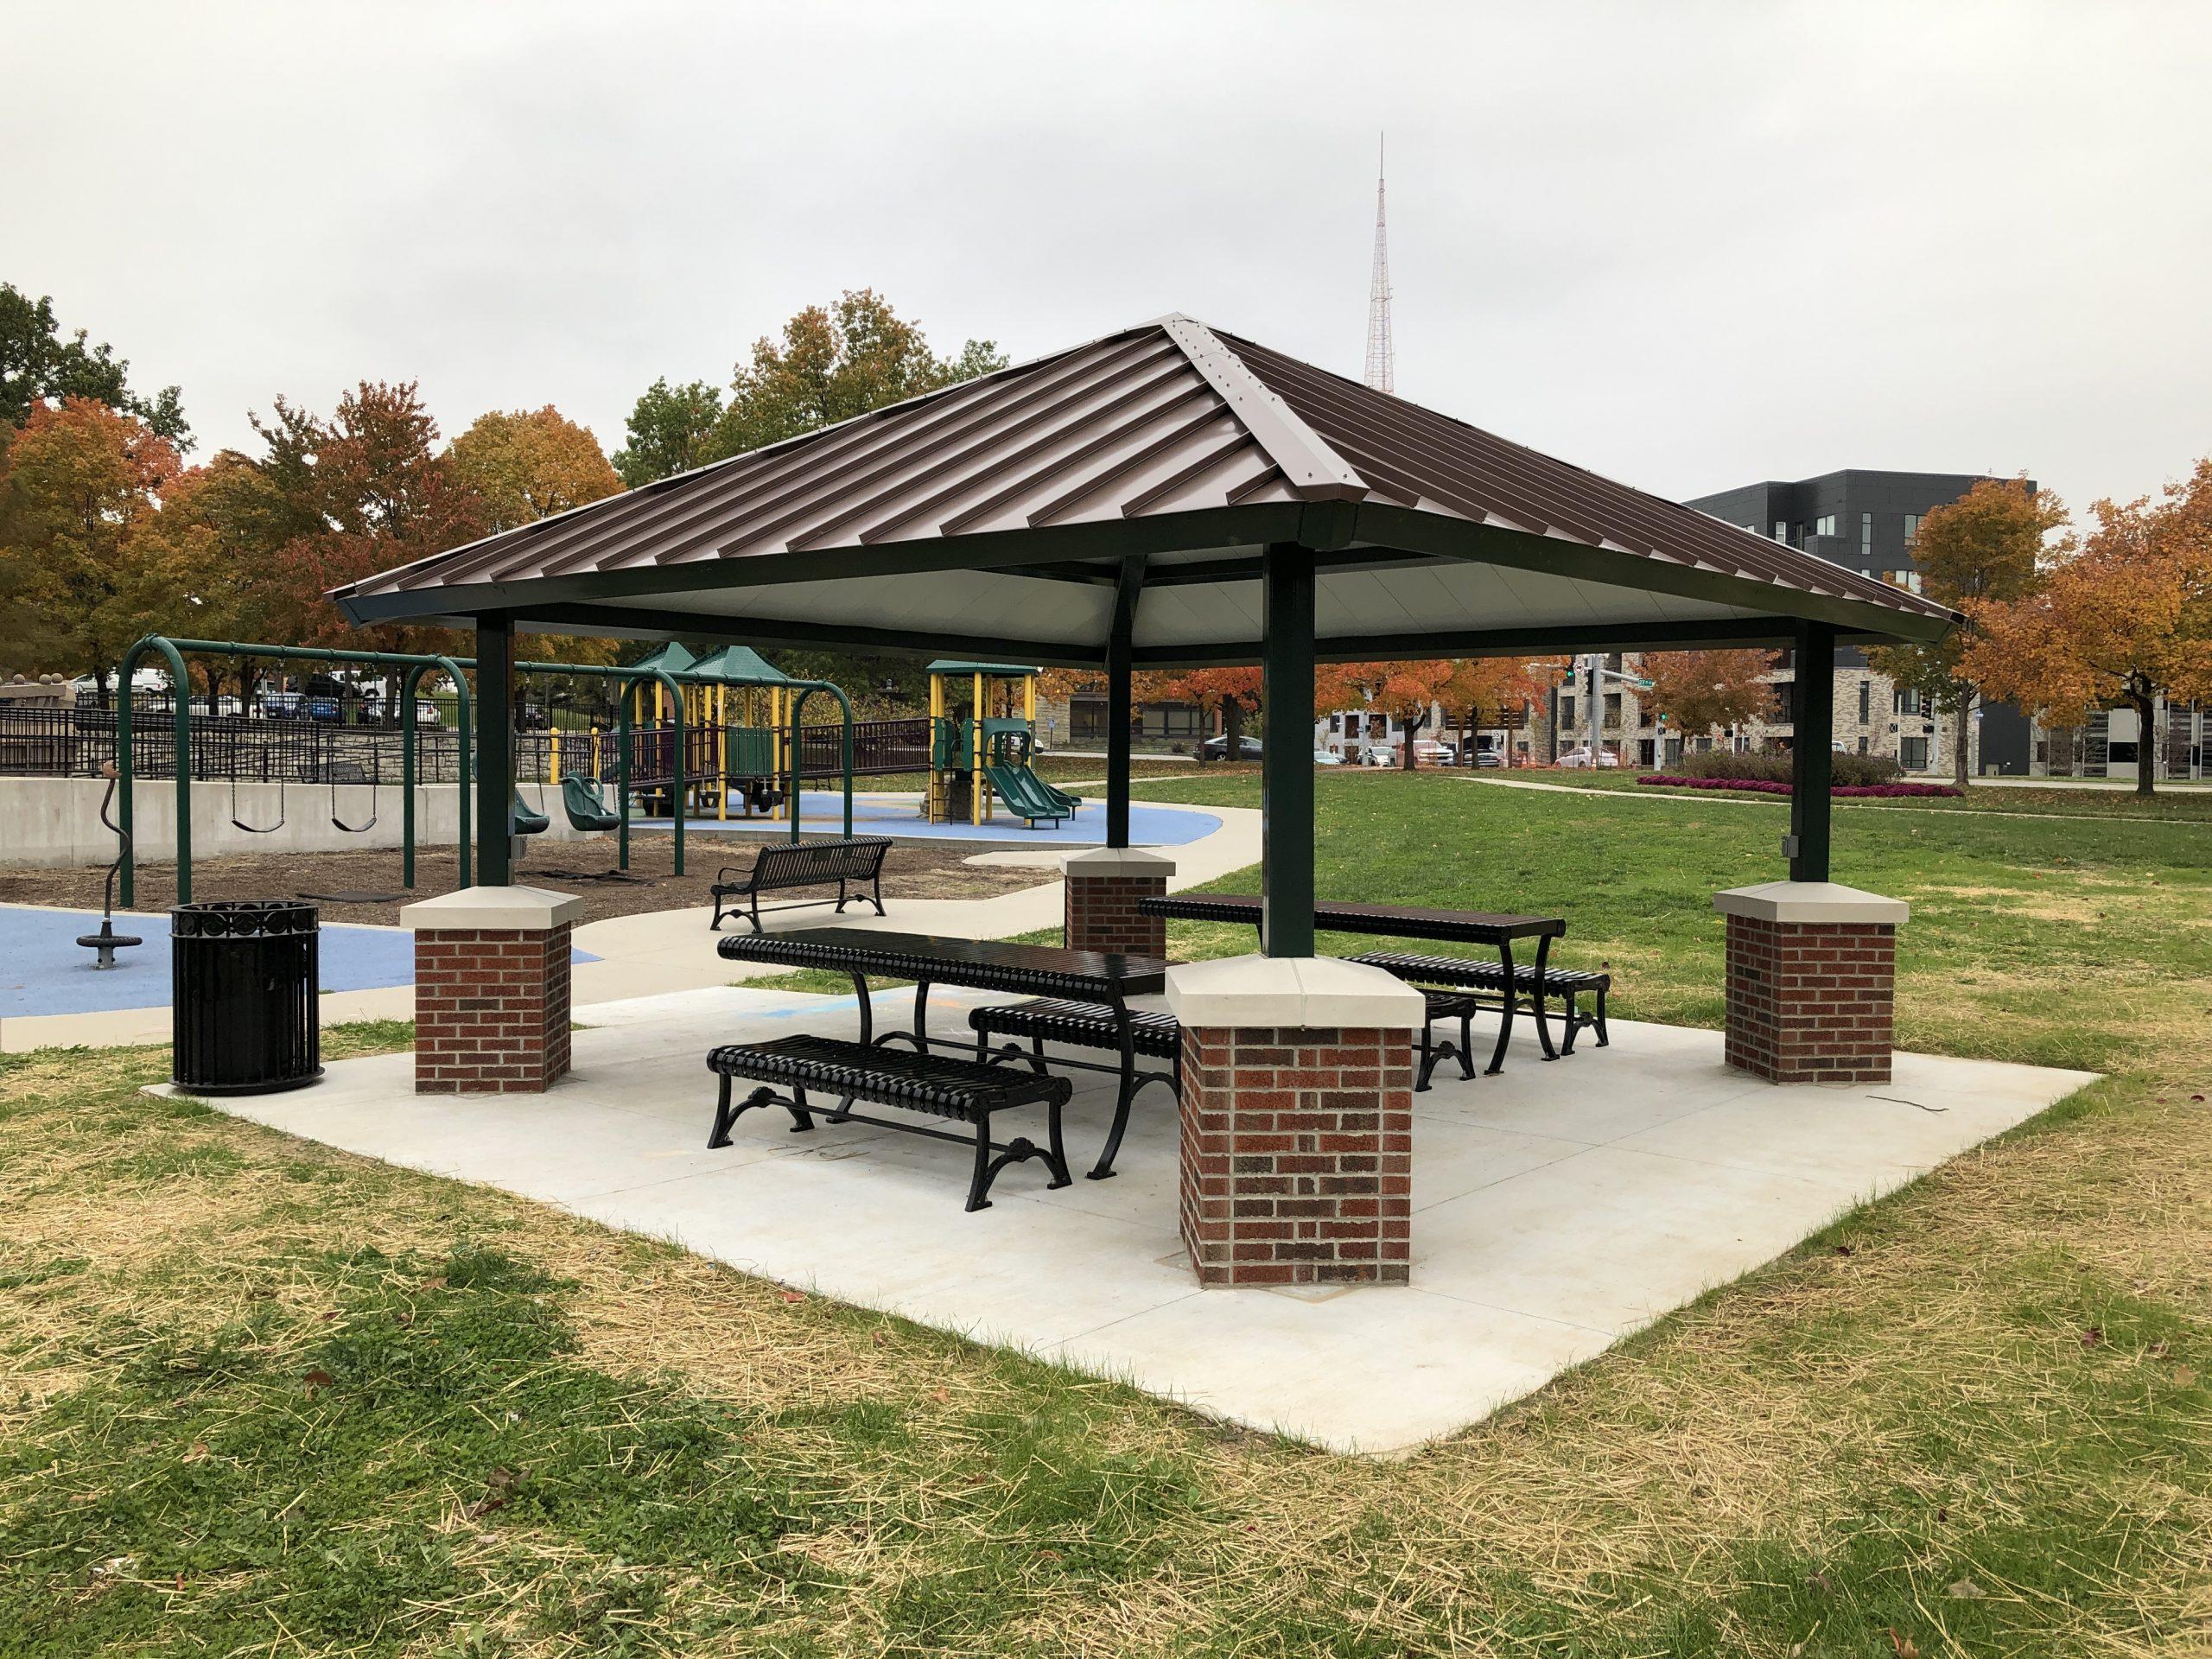 Sheila Kemper Dietrich Park Shelter #1 (Reservable May 1-October 31)